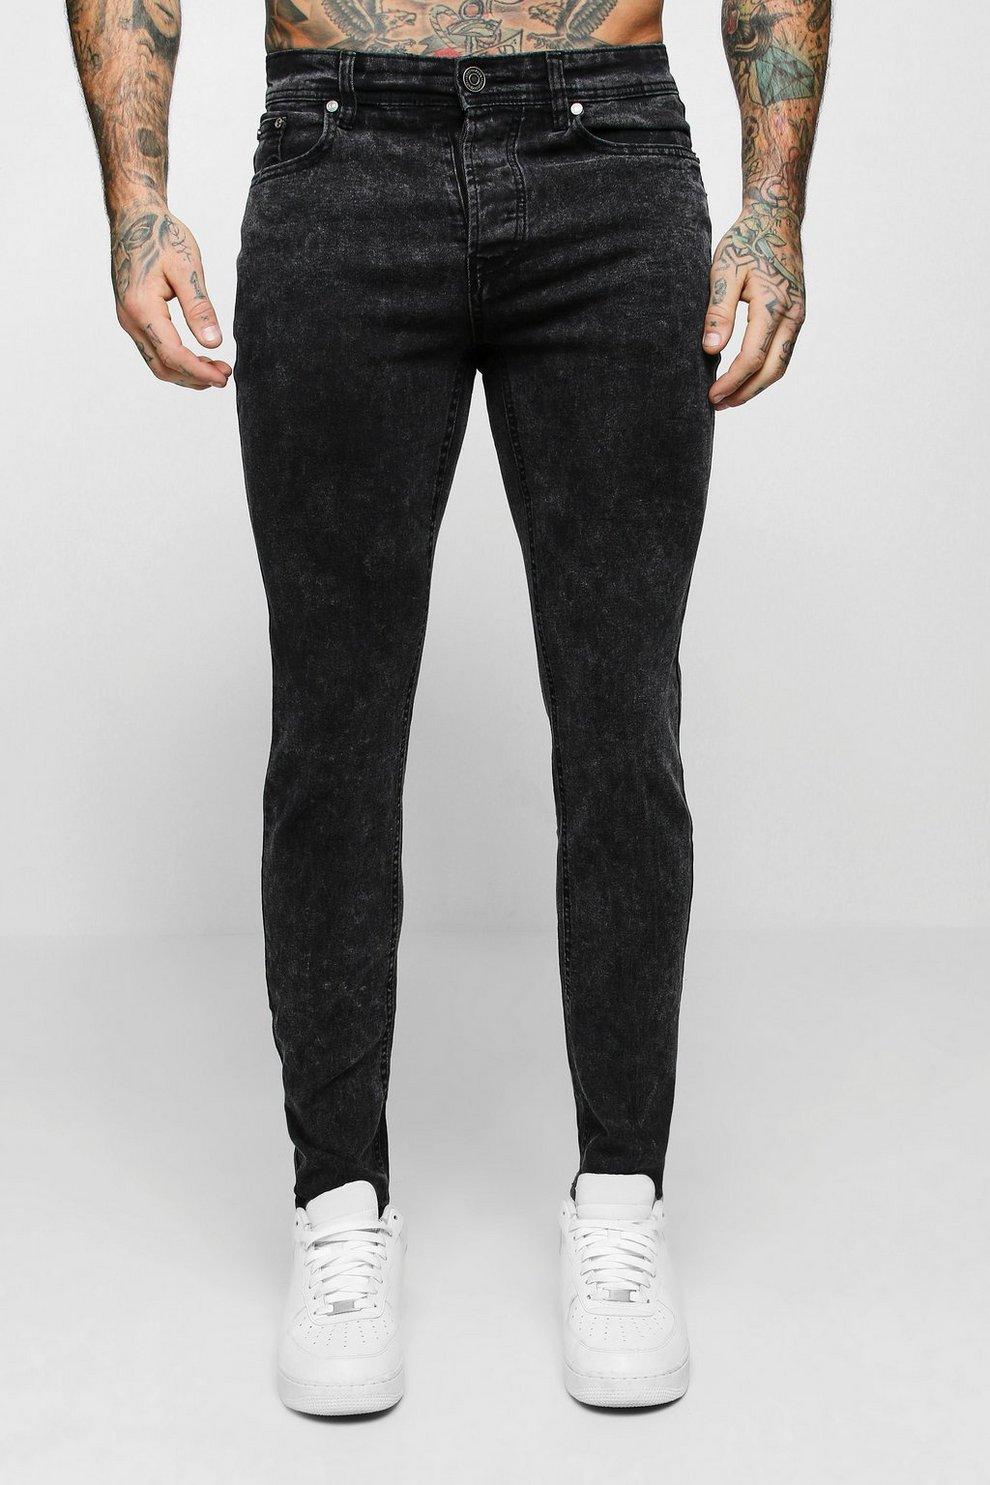 375c023aa27 Skinny Fit Charcoal Acid Wash Jeans - boohooMAN